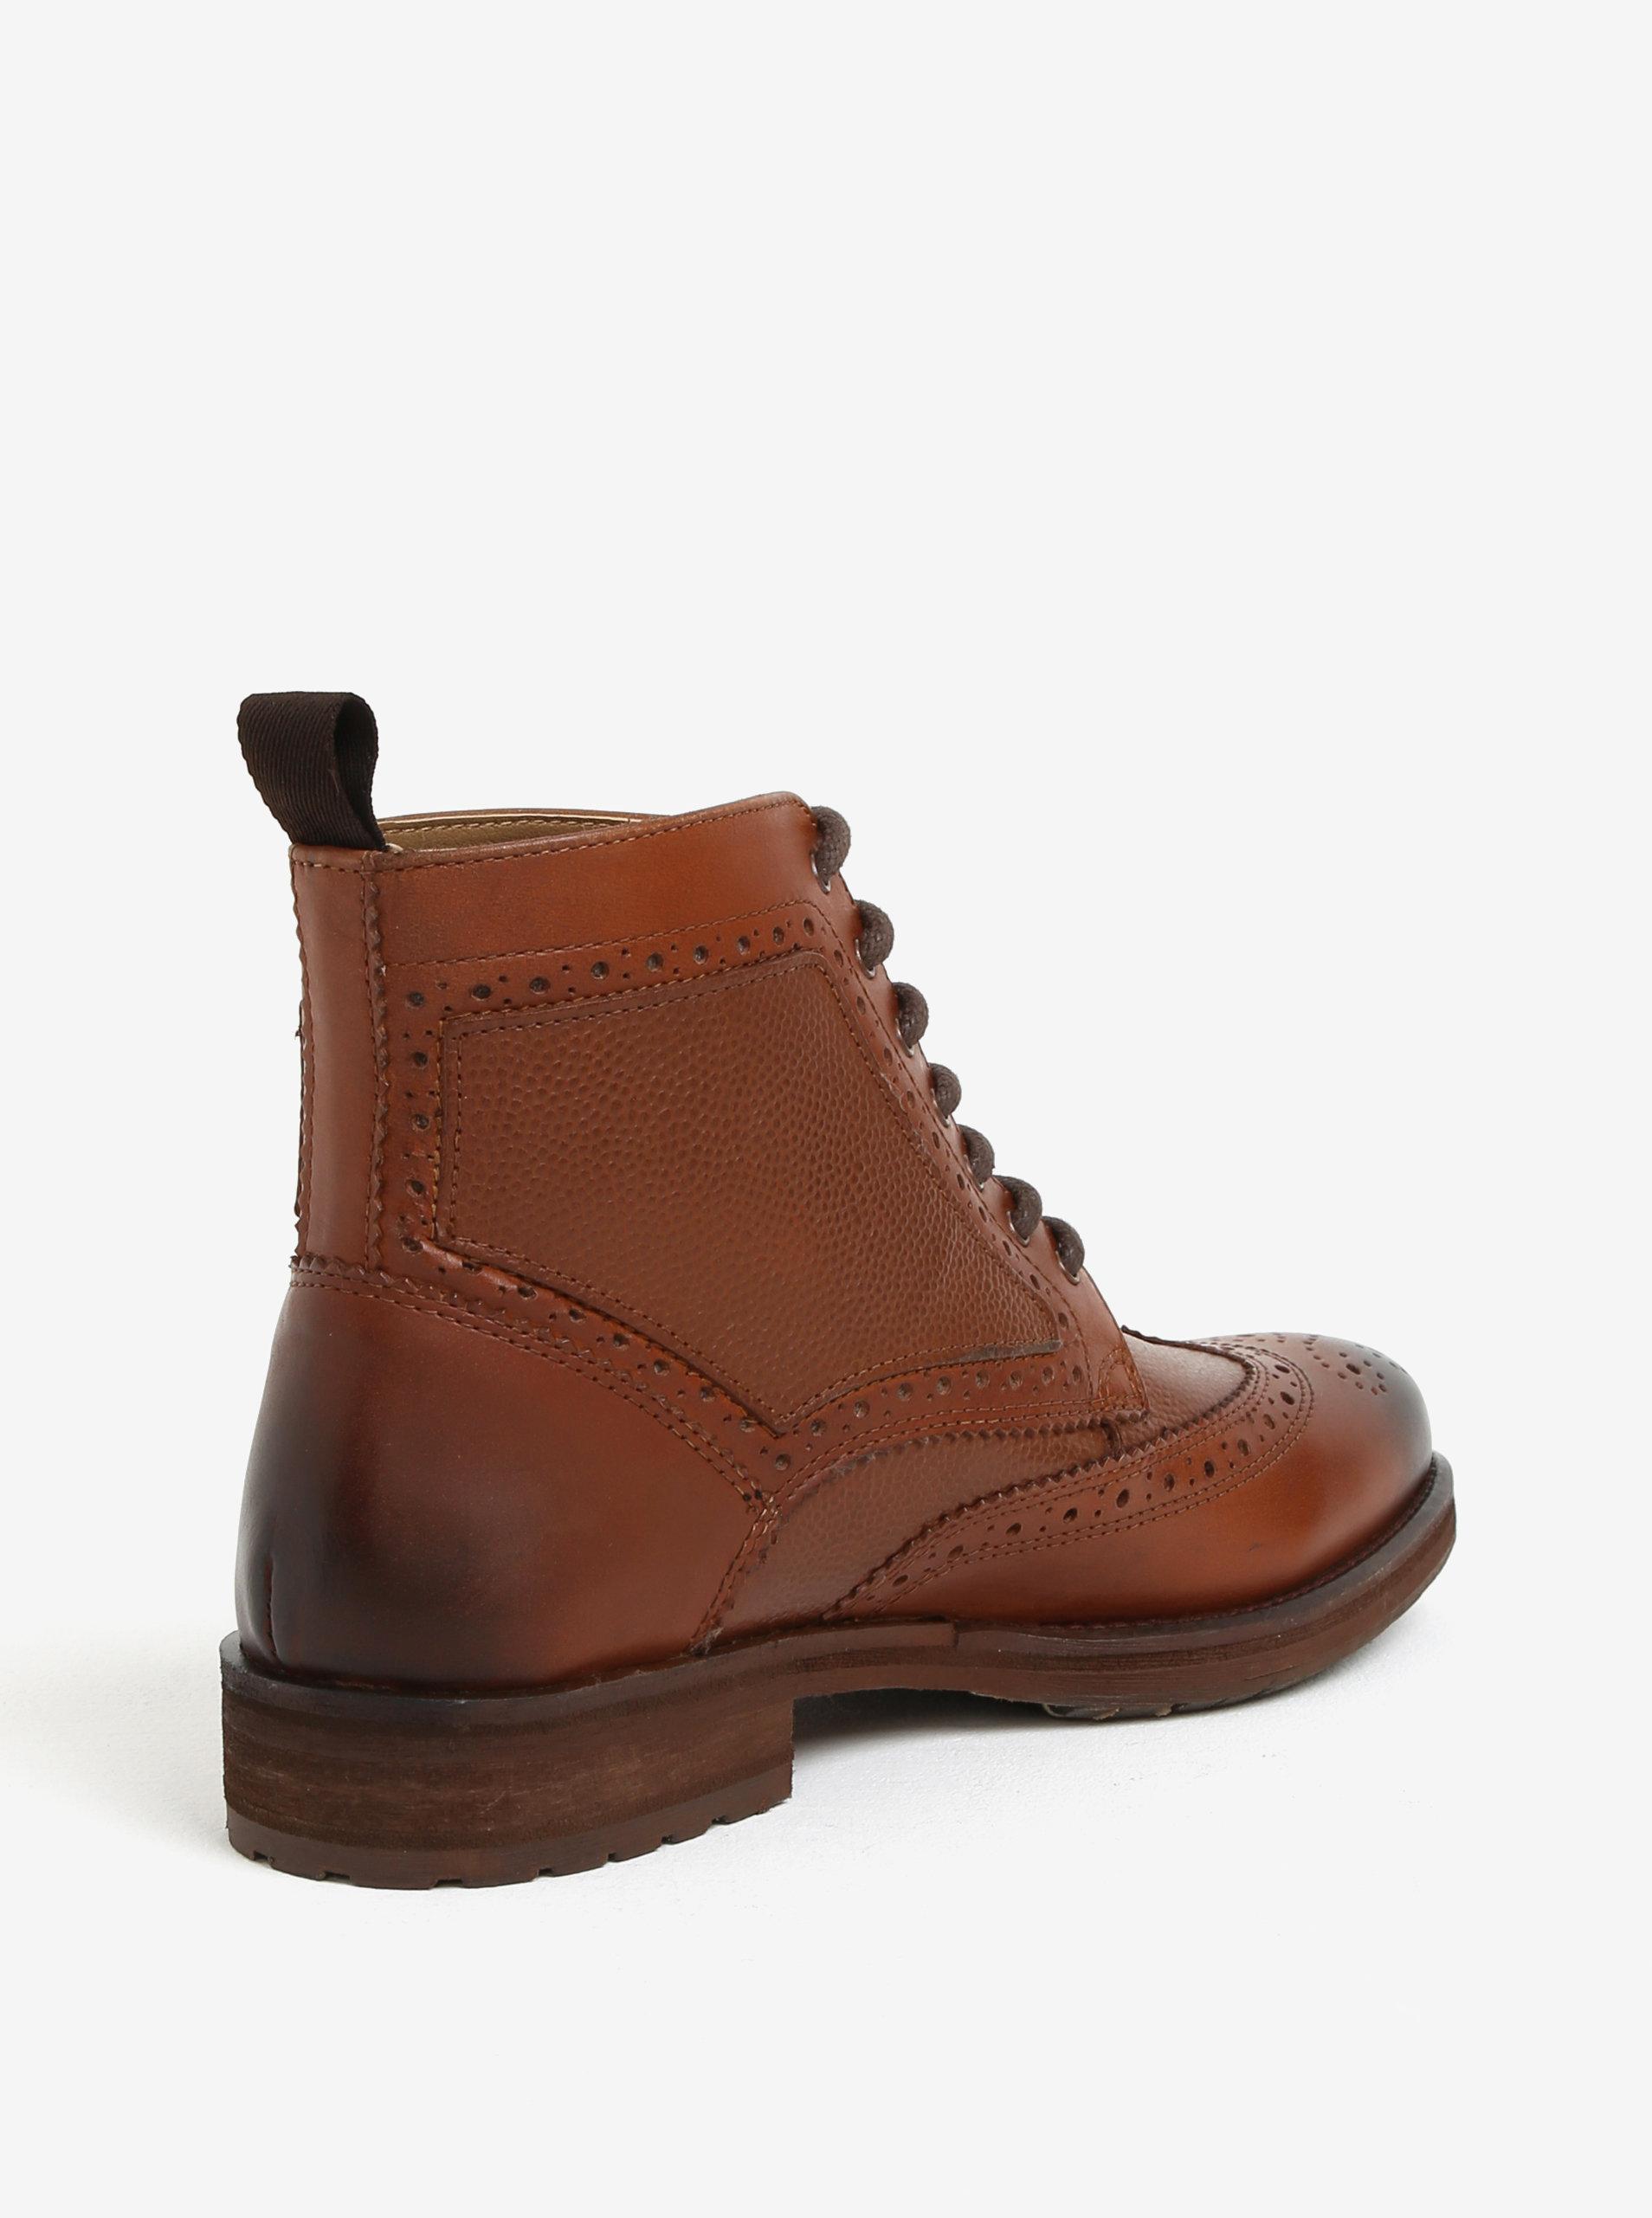 5831e1fbb728b Hnědé pánské kožené brogue kotníkové boty Burton Menswear London ...